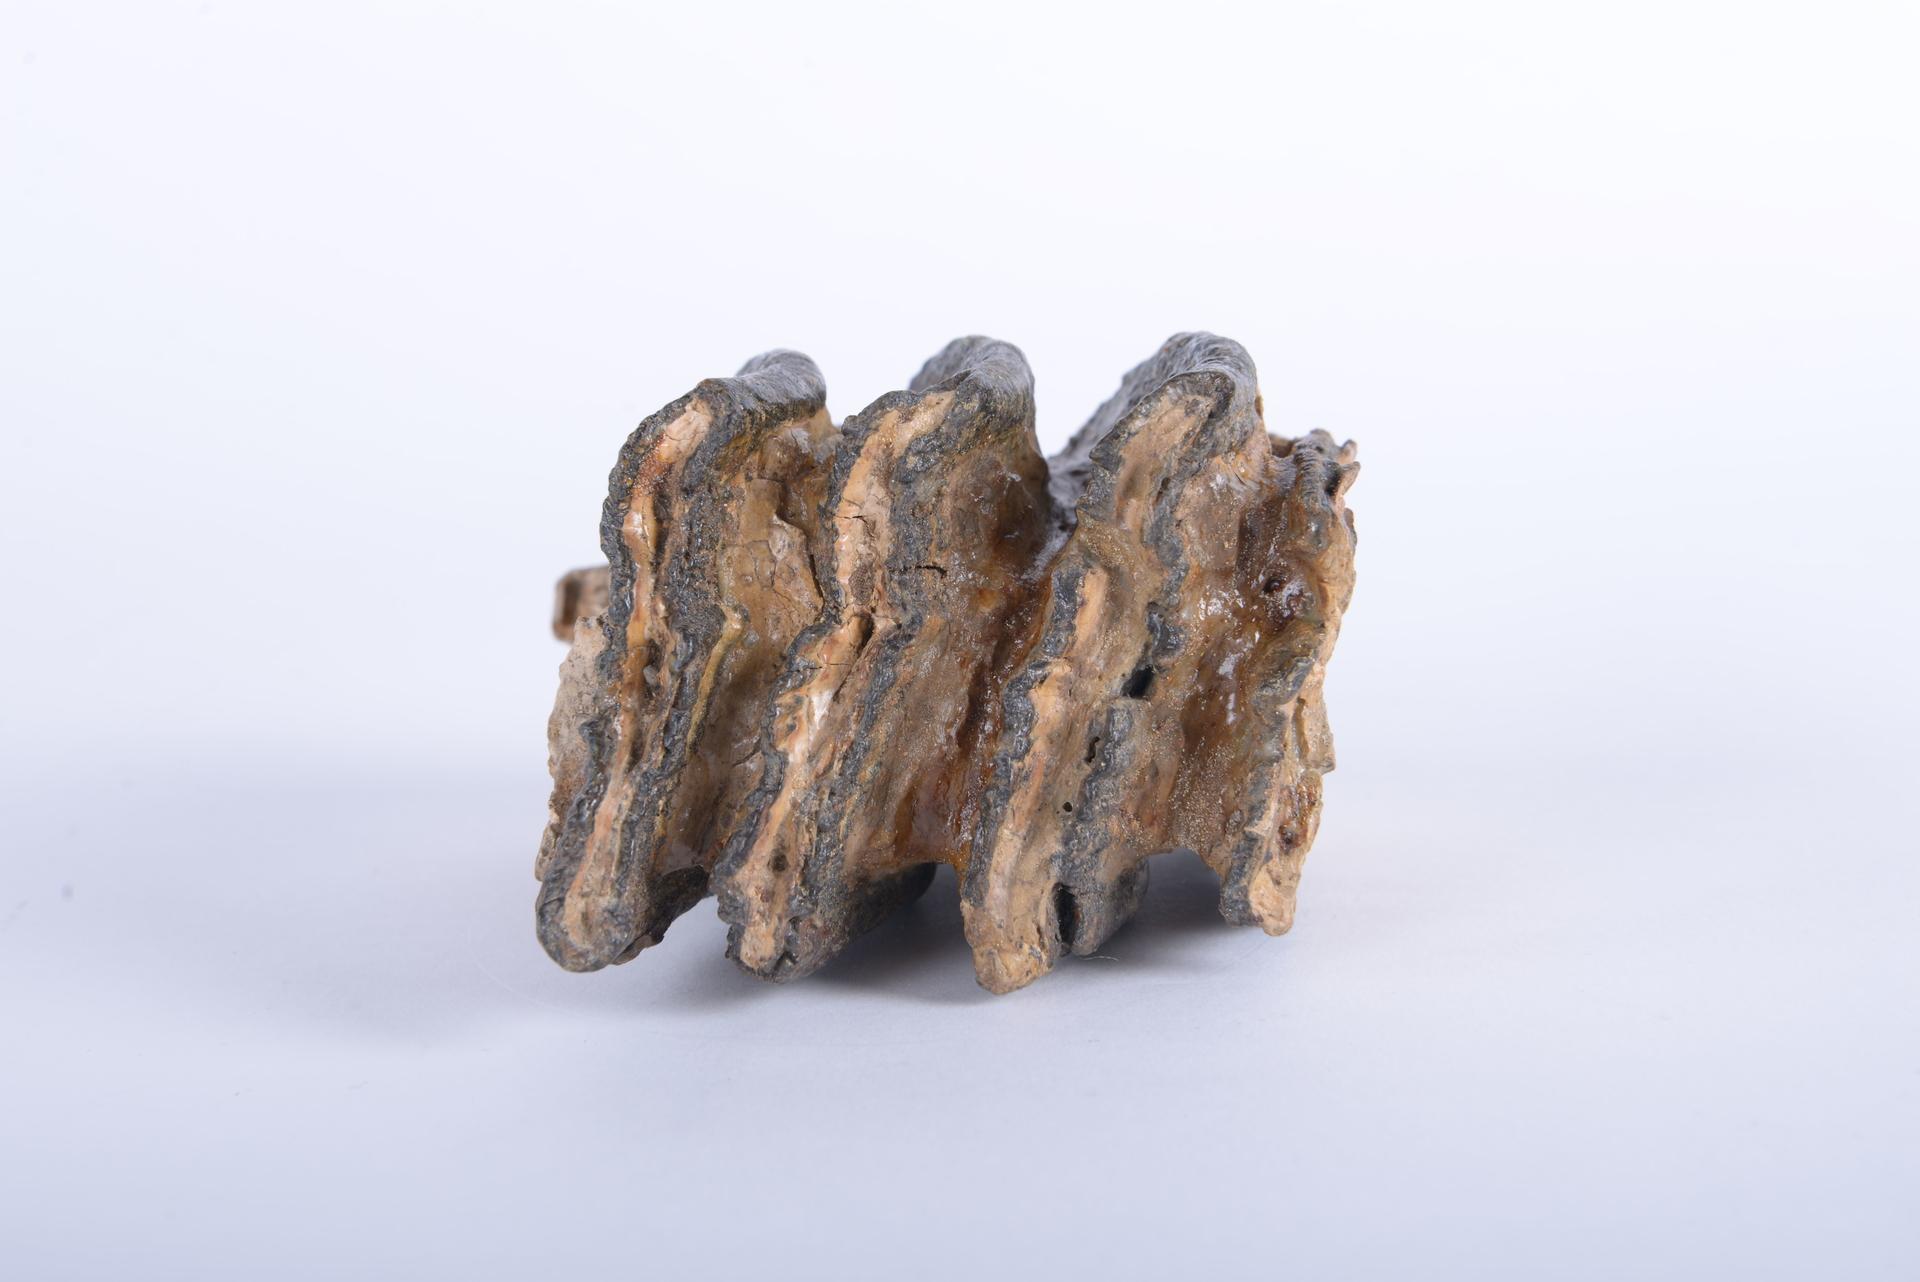 RGM.405888.b | Euelephas namadicus